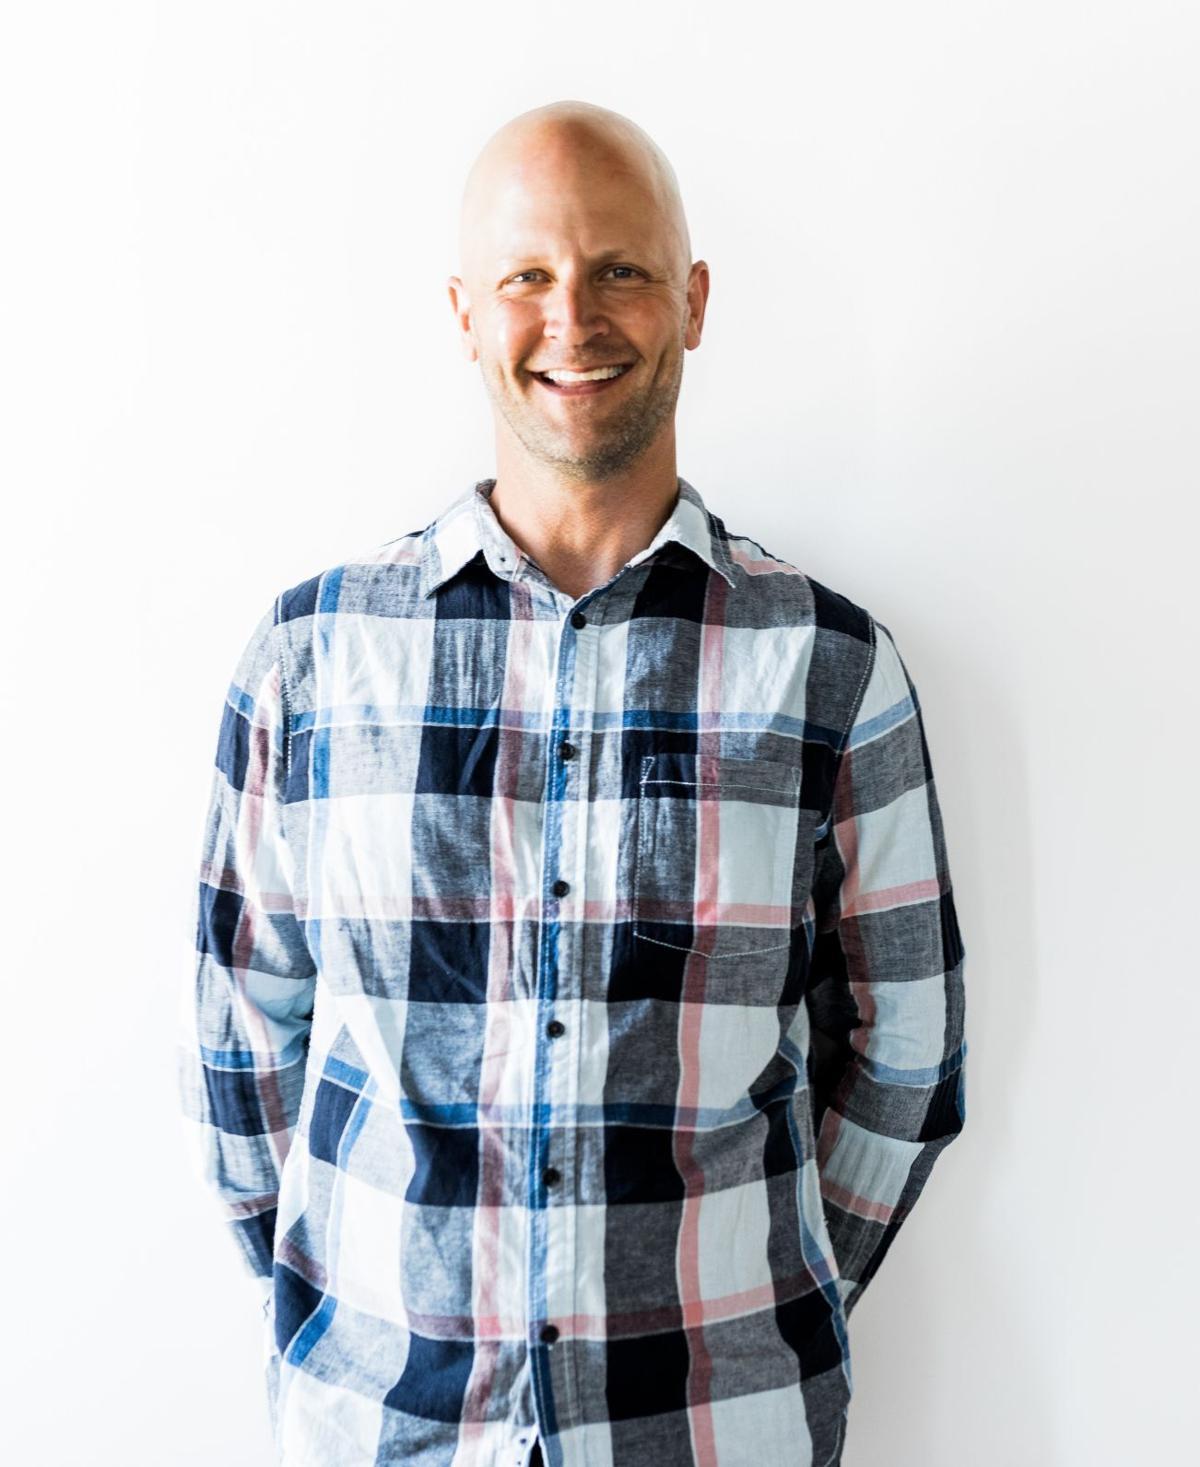 Matt Udermann